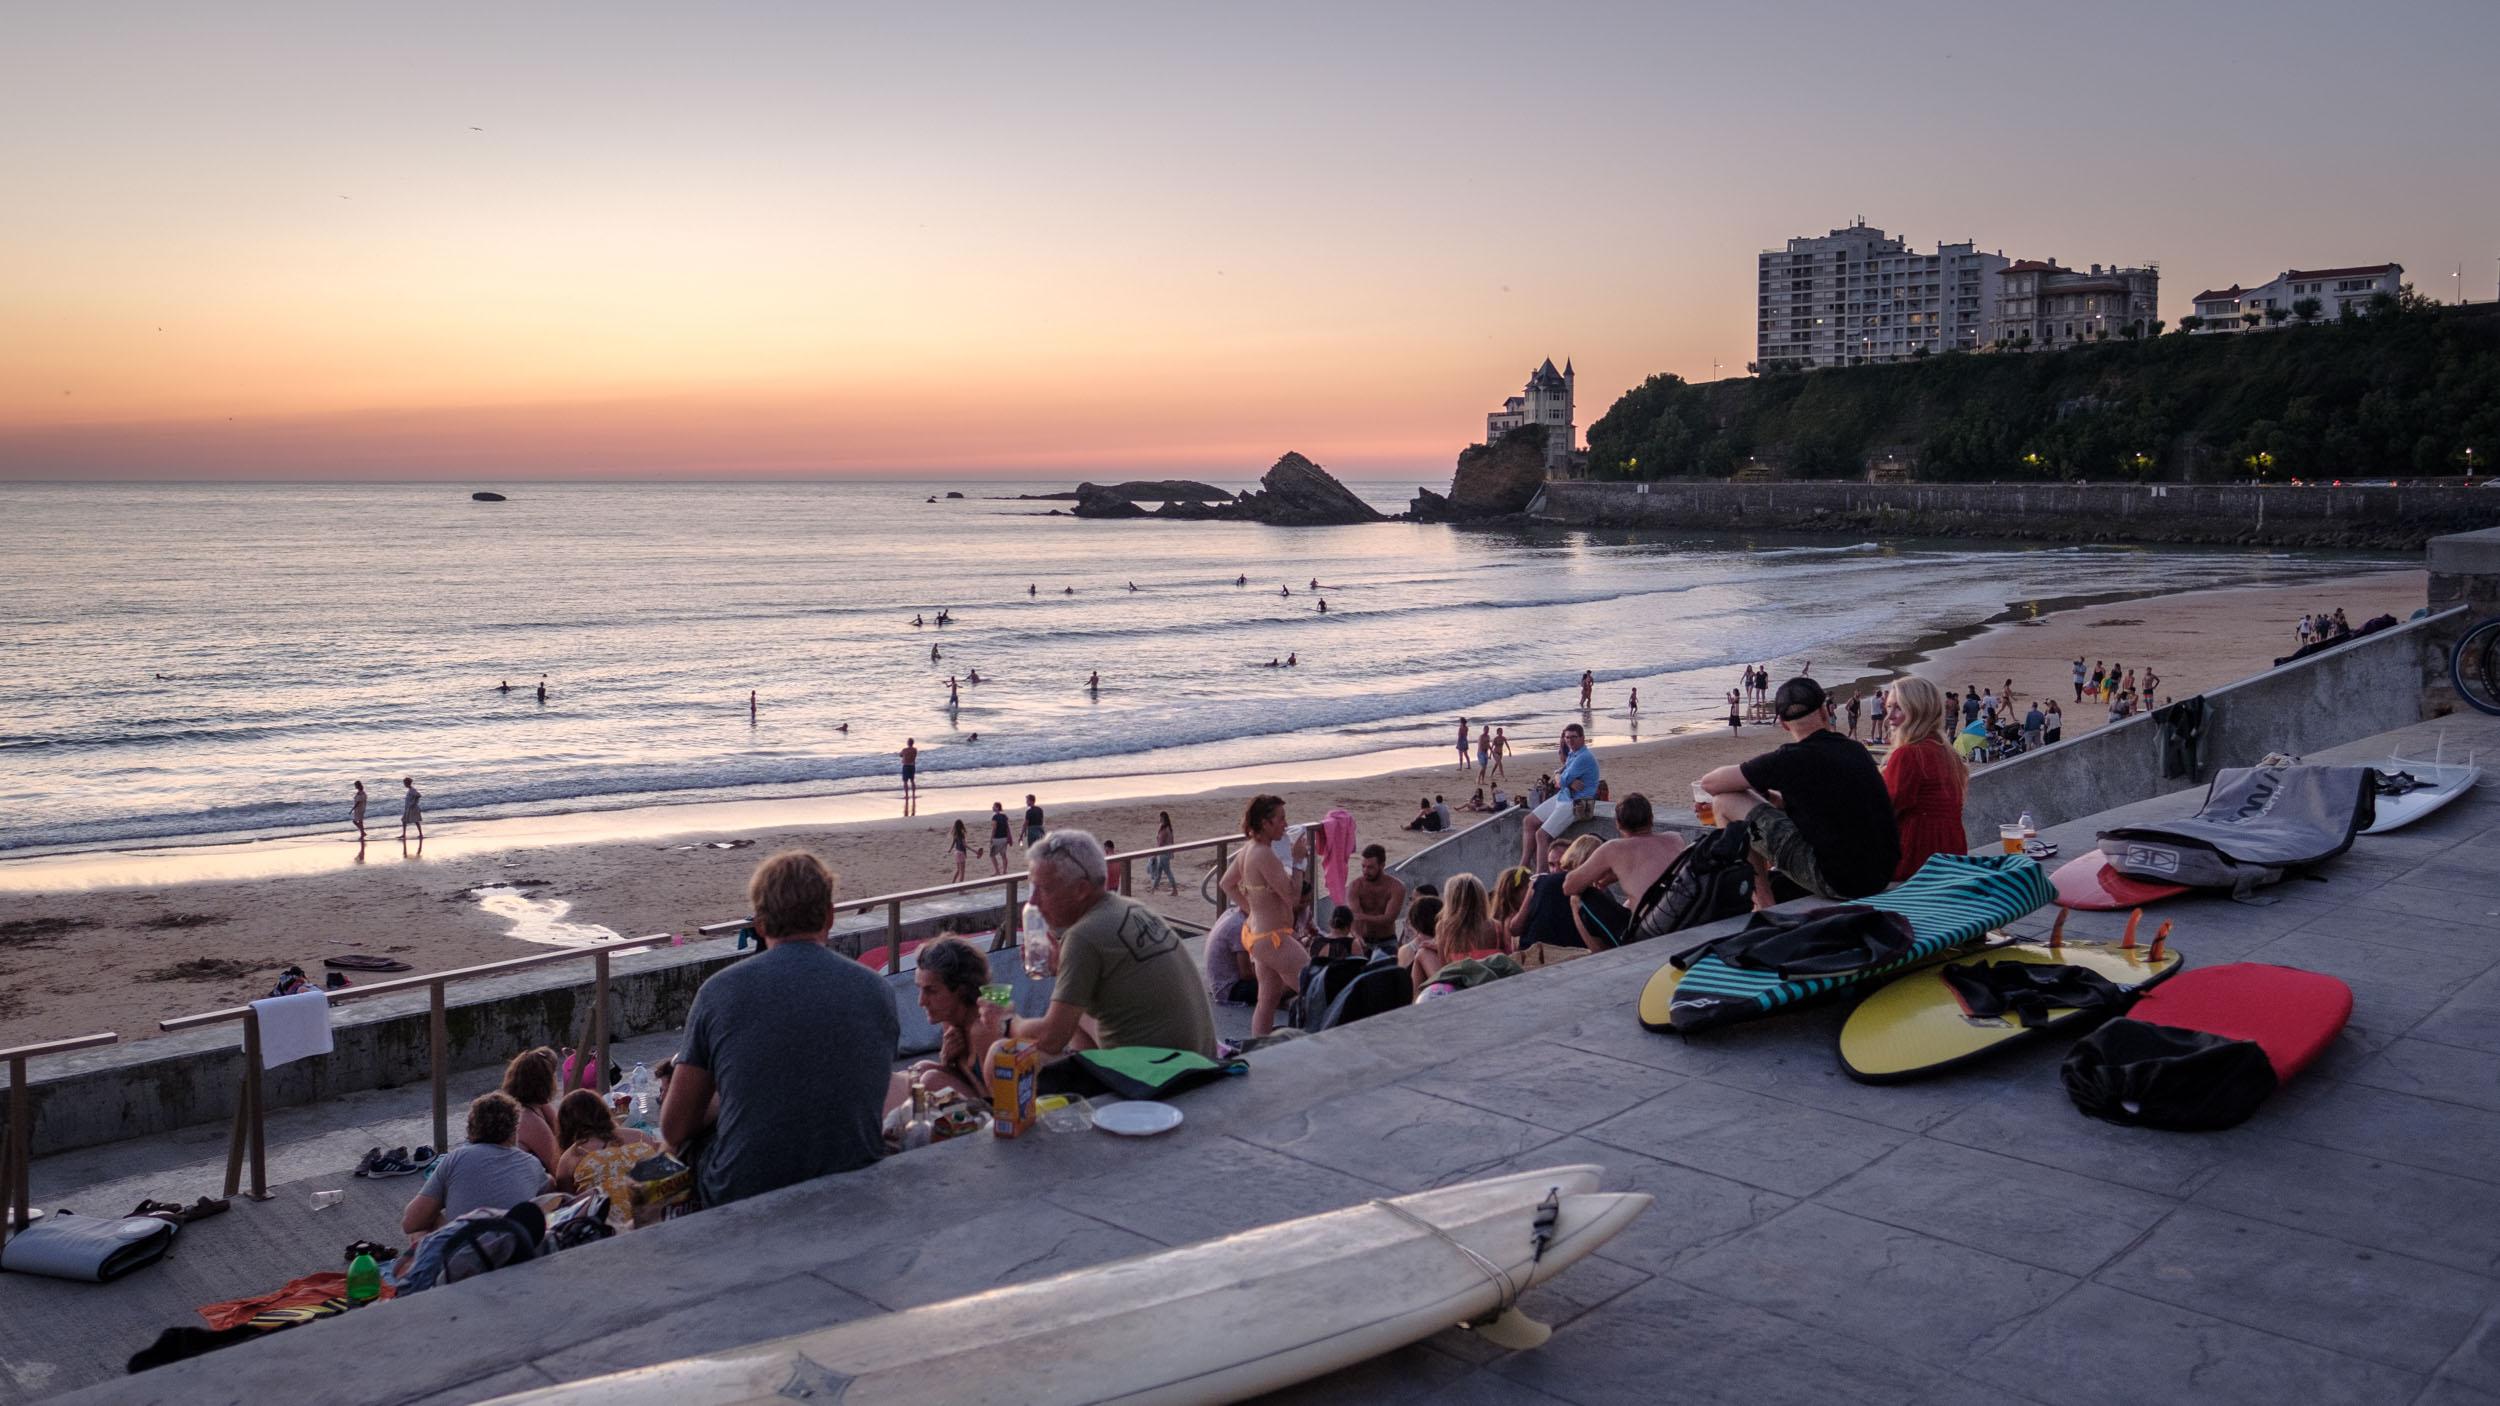 Abend in Biarritz